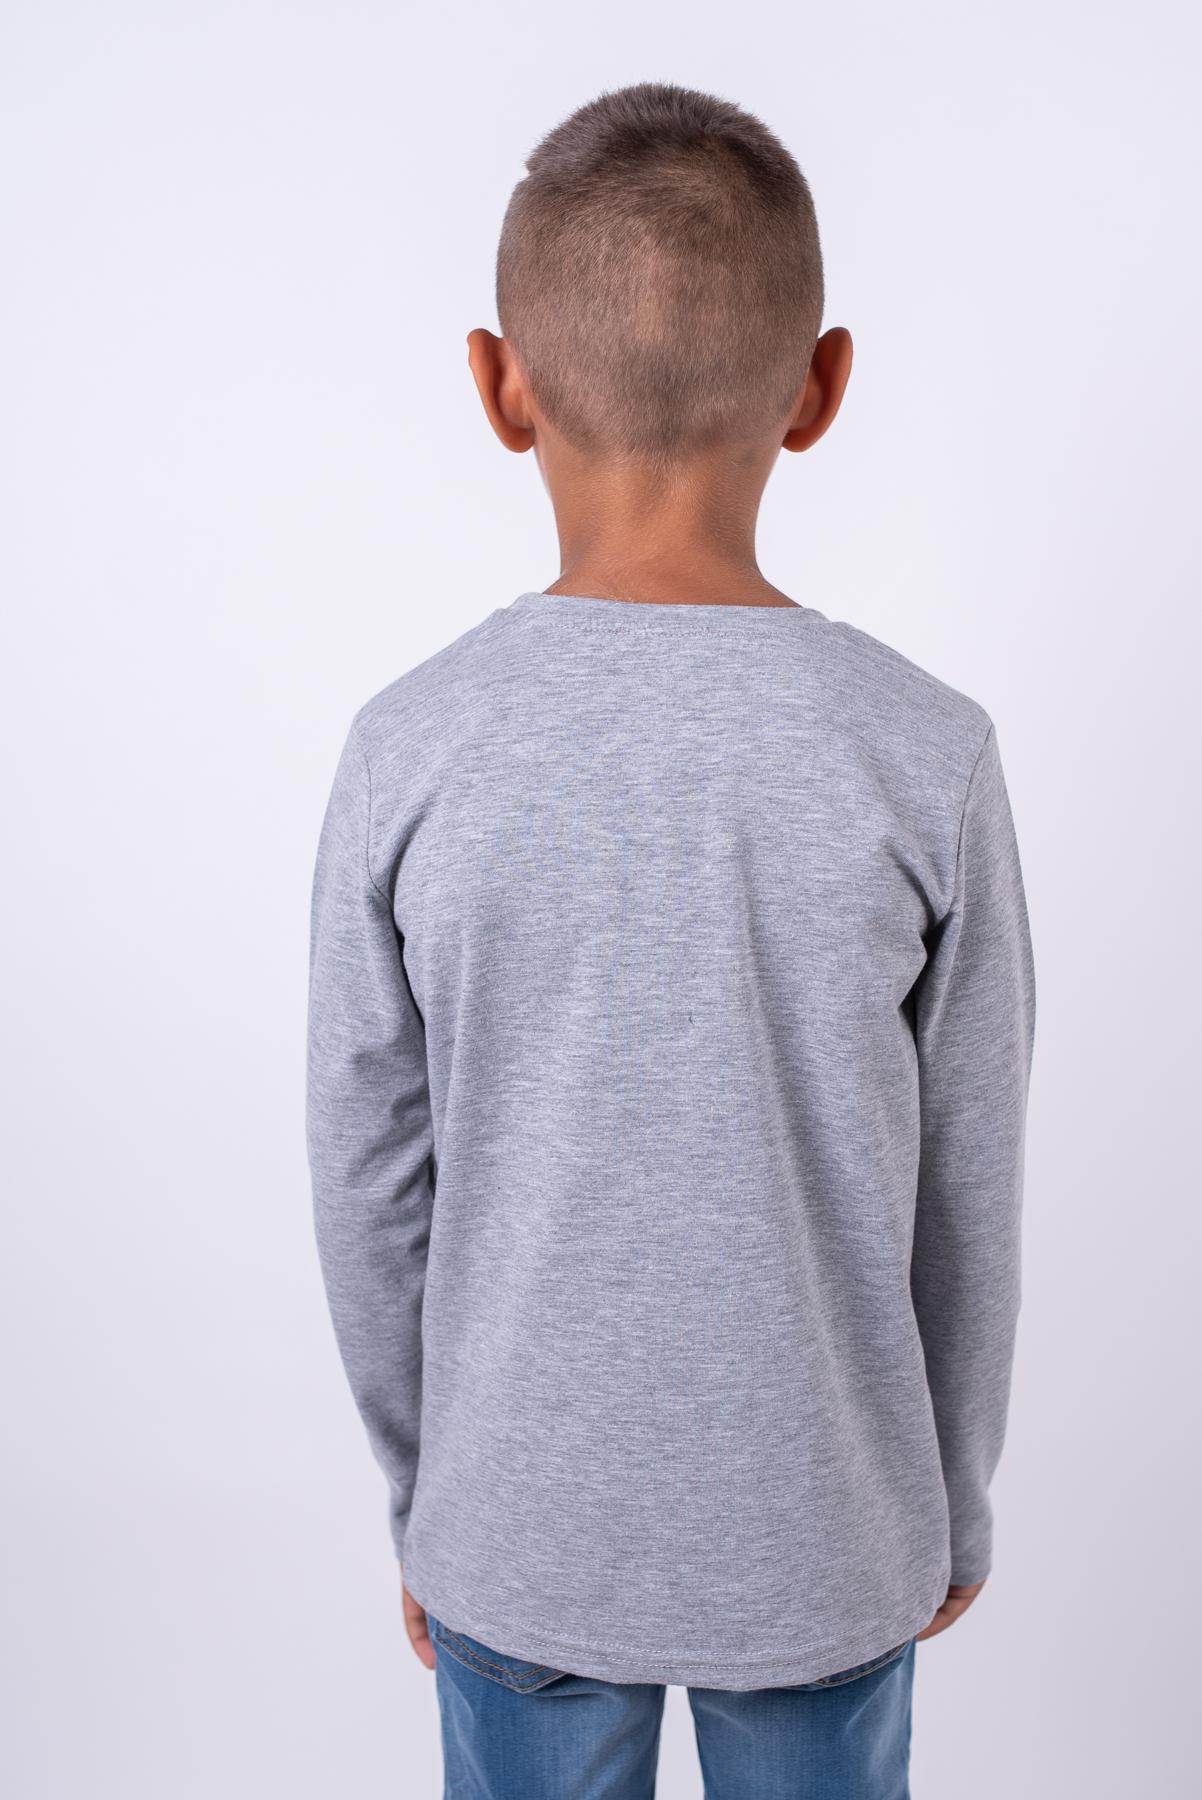 Blouse boy long sleeves